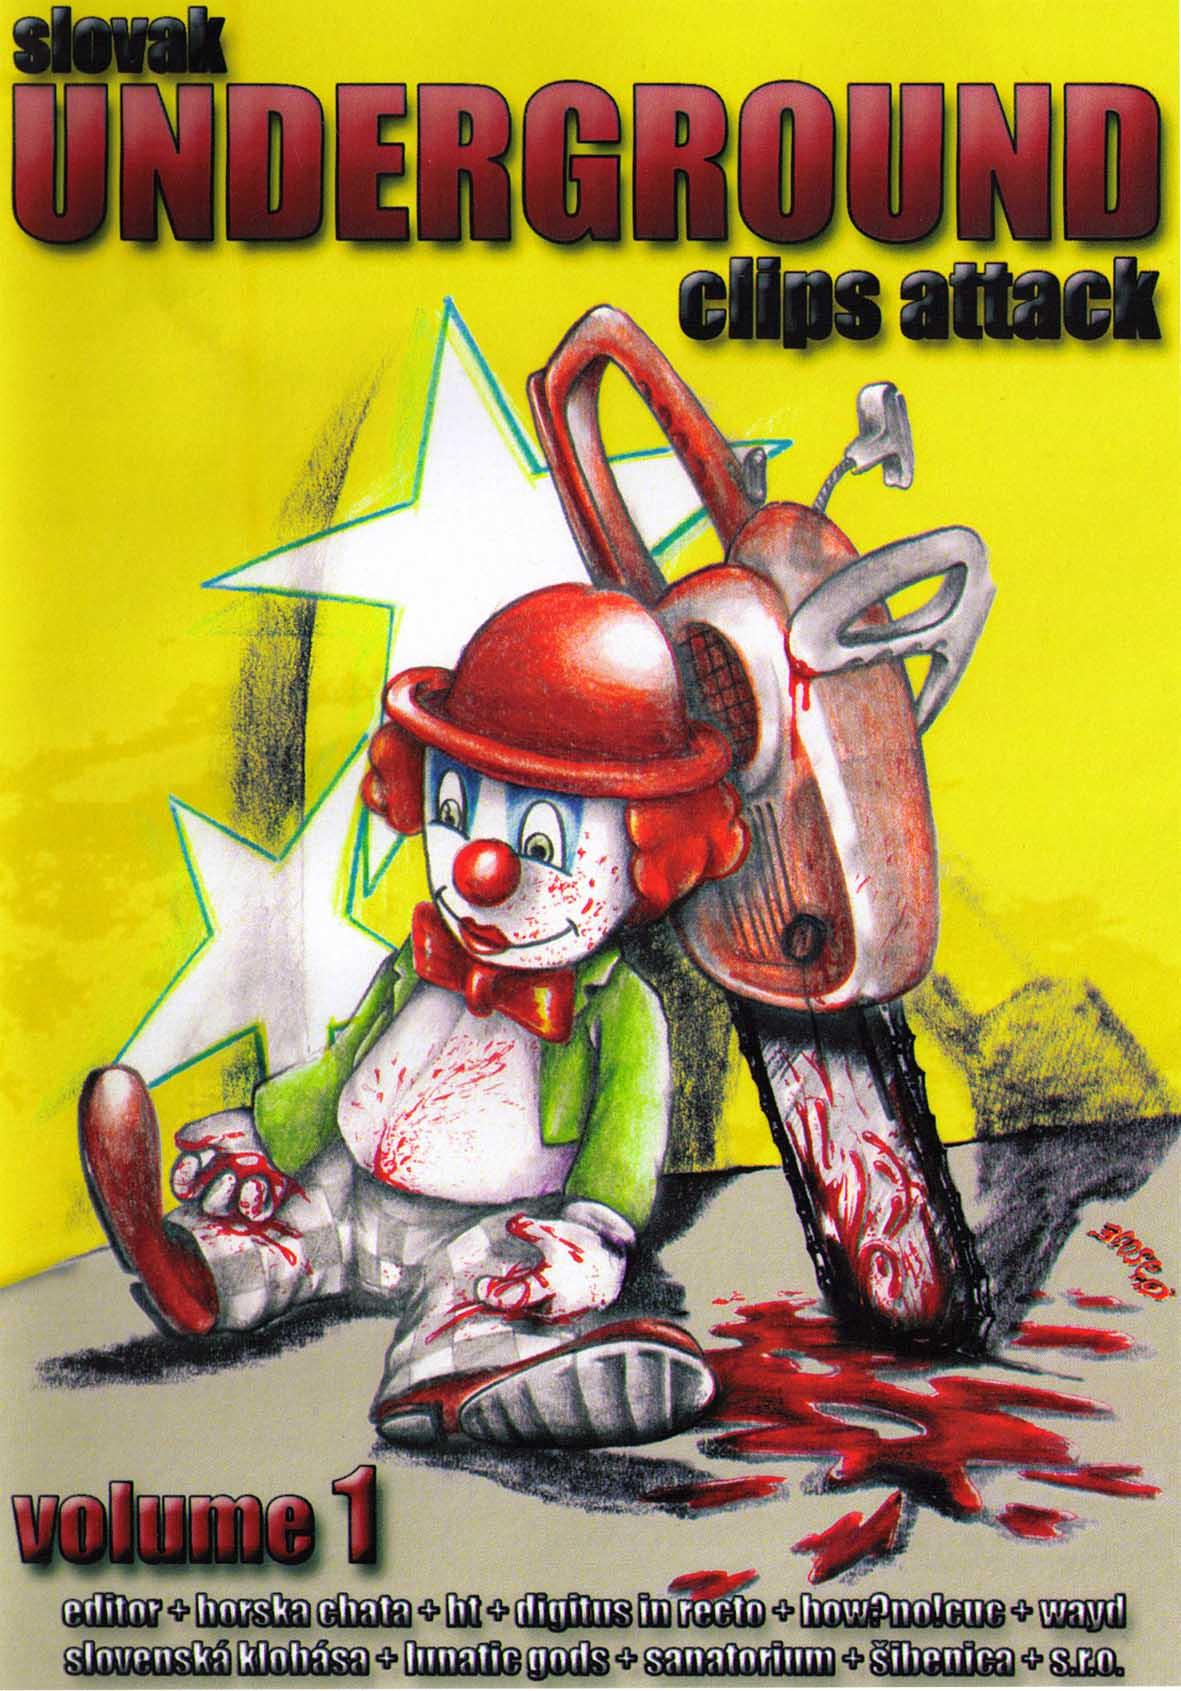 SLOVAK UNDERGROUND CLIPS ATTACK Volume I.